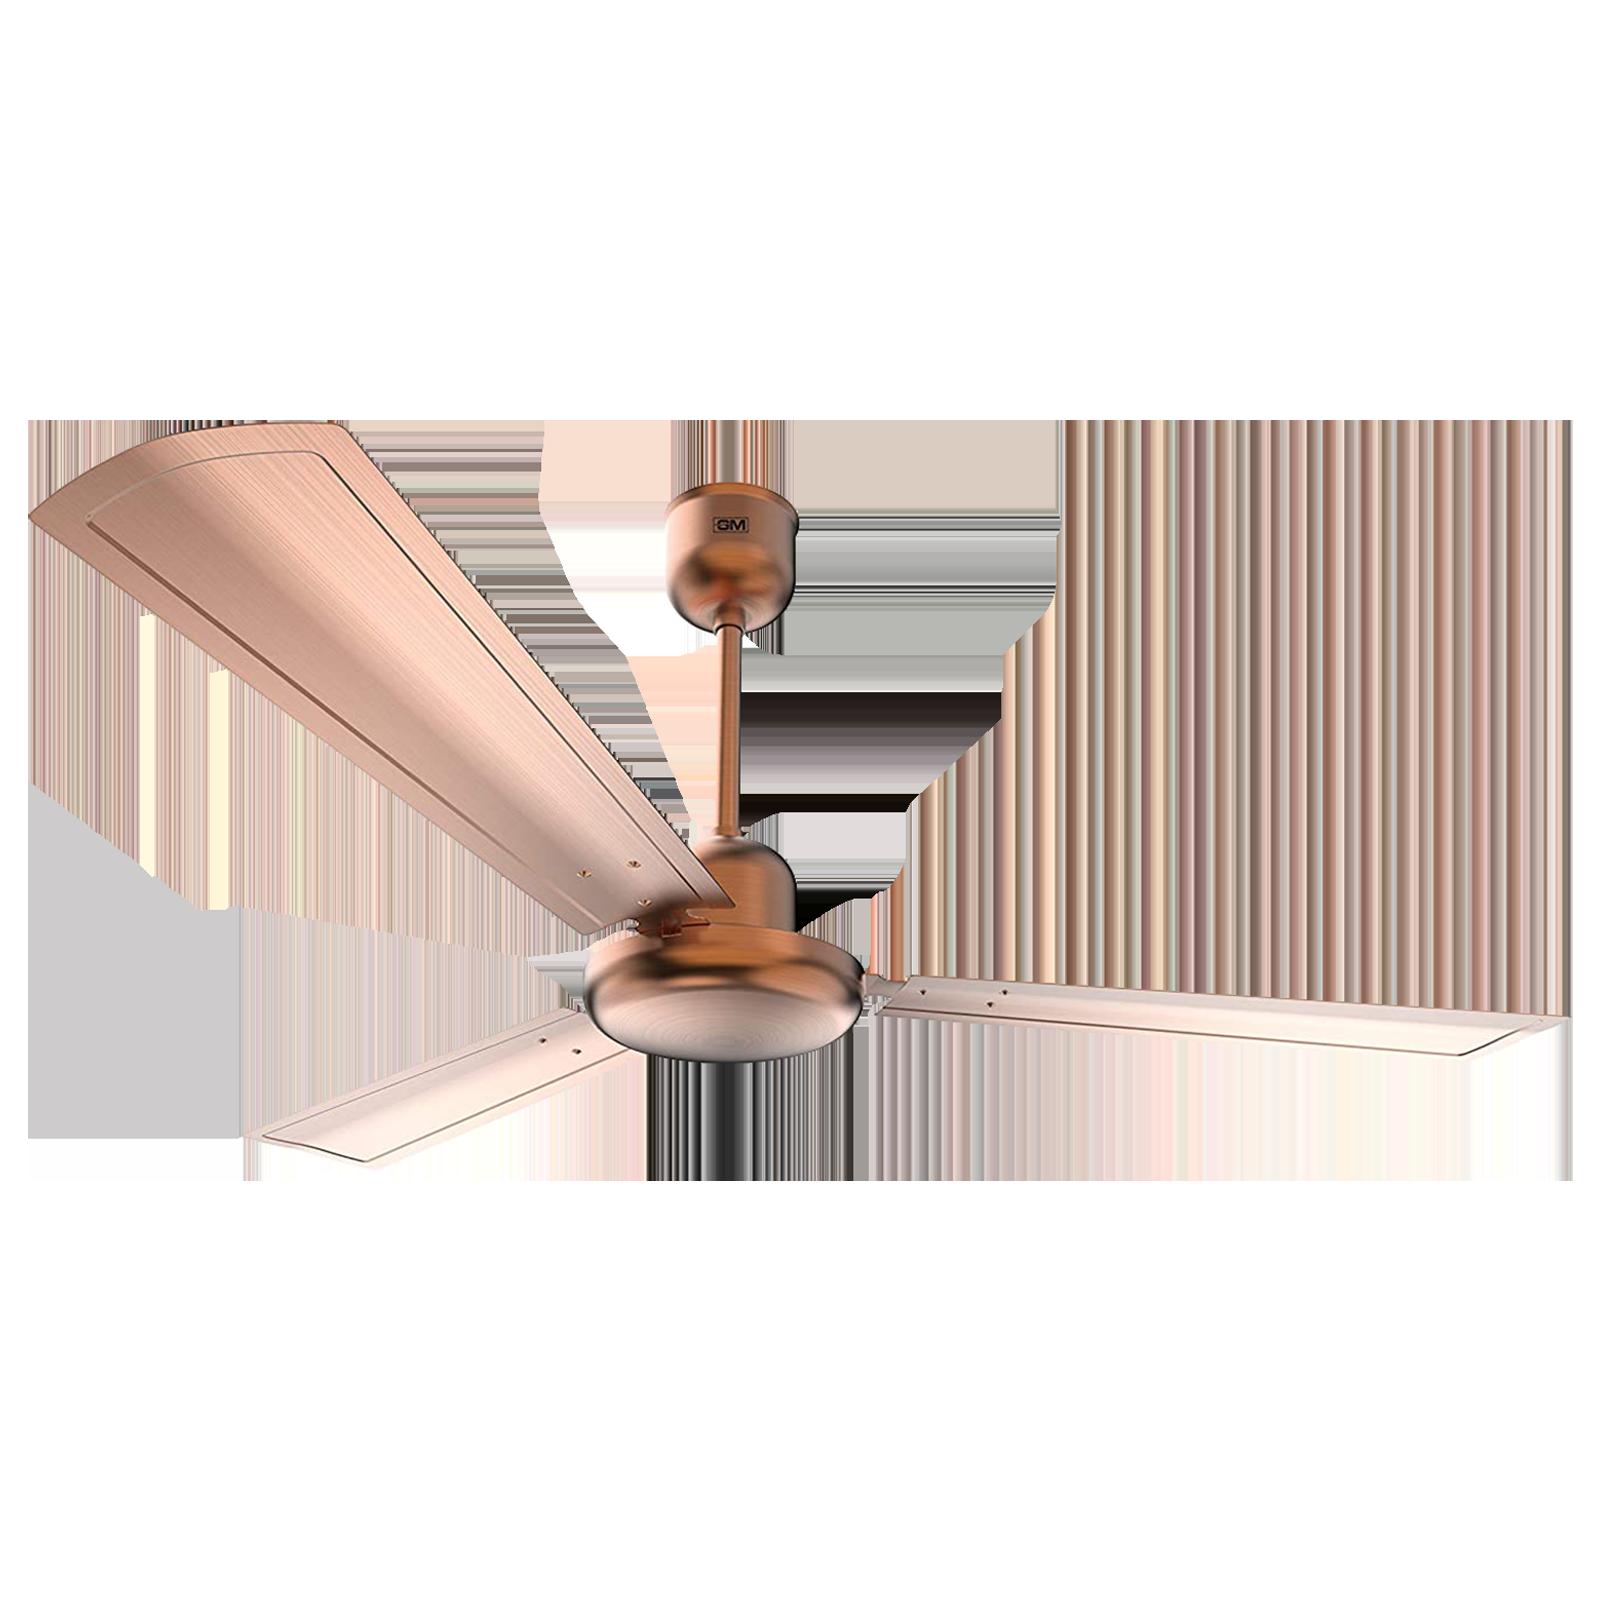 GM Spencer 120 cm Sweep 3 Blade Ceiling Fan (Aerodynamically Designed Blades, CFP480012CUEP, Bronze)_1